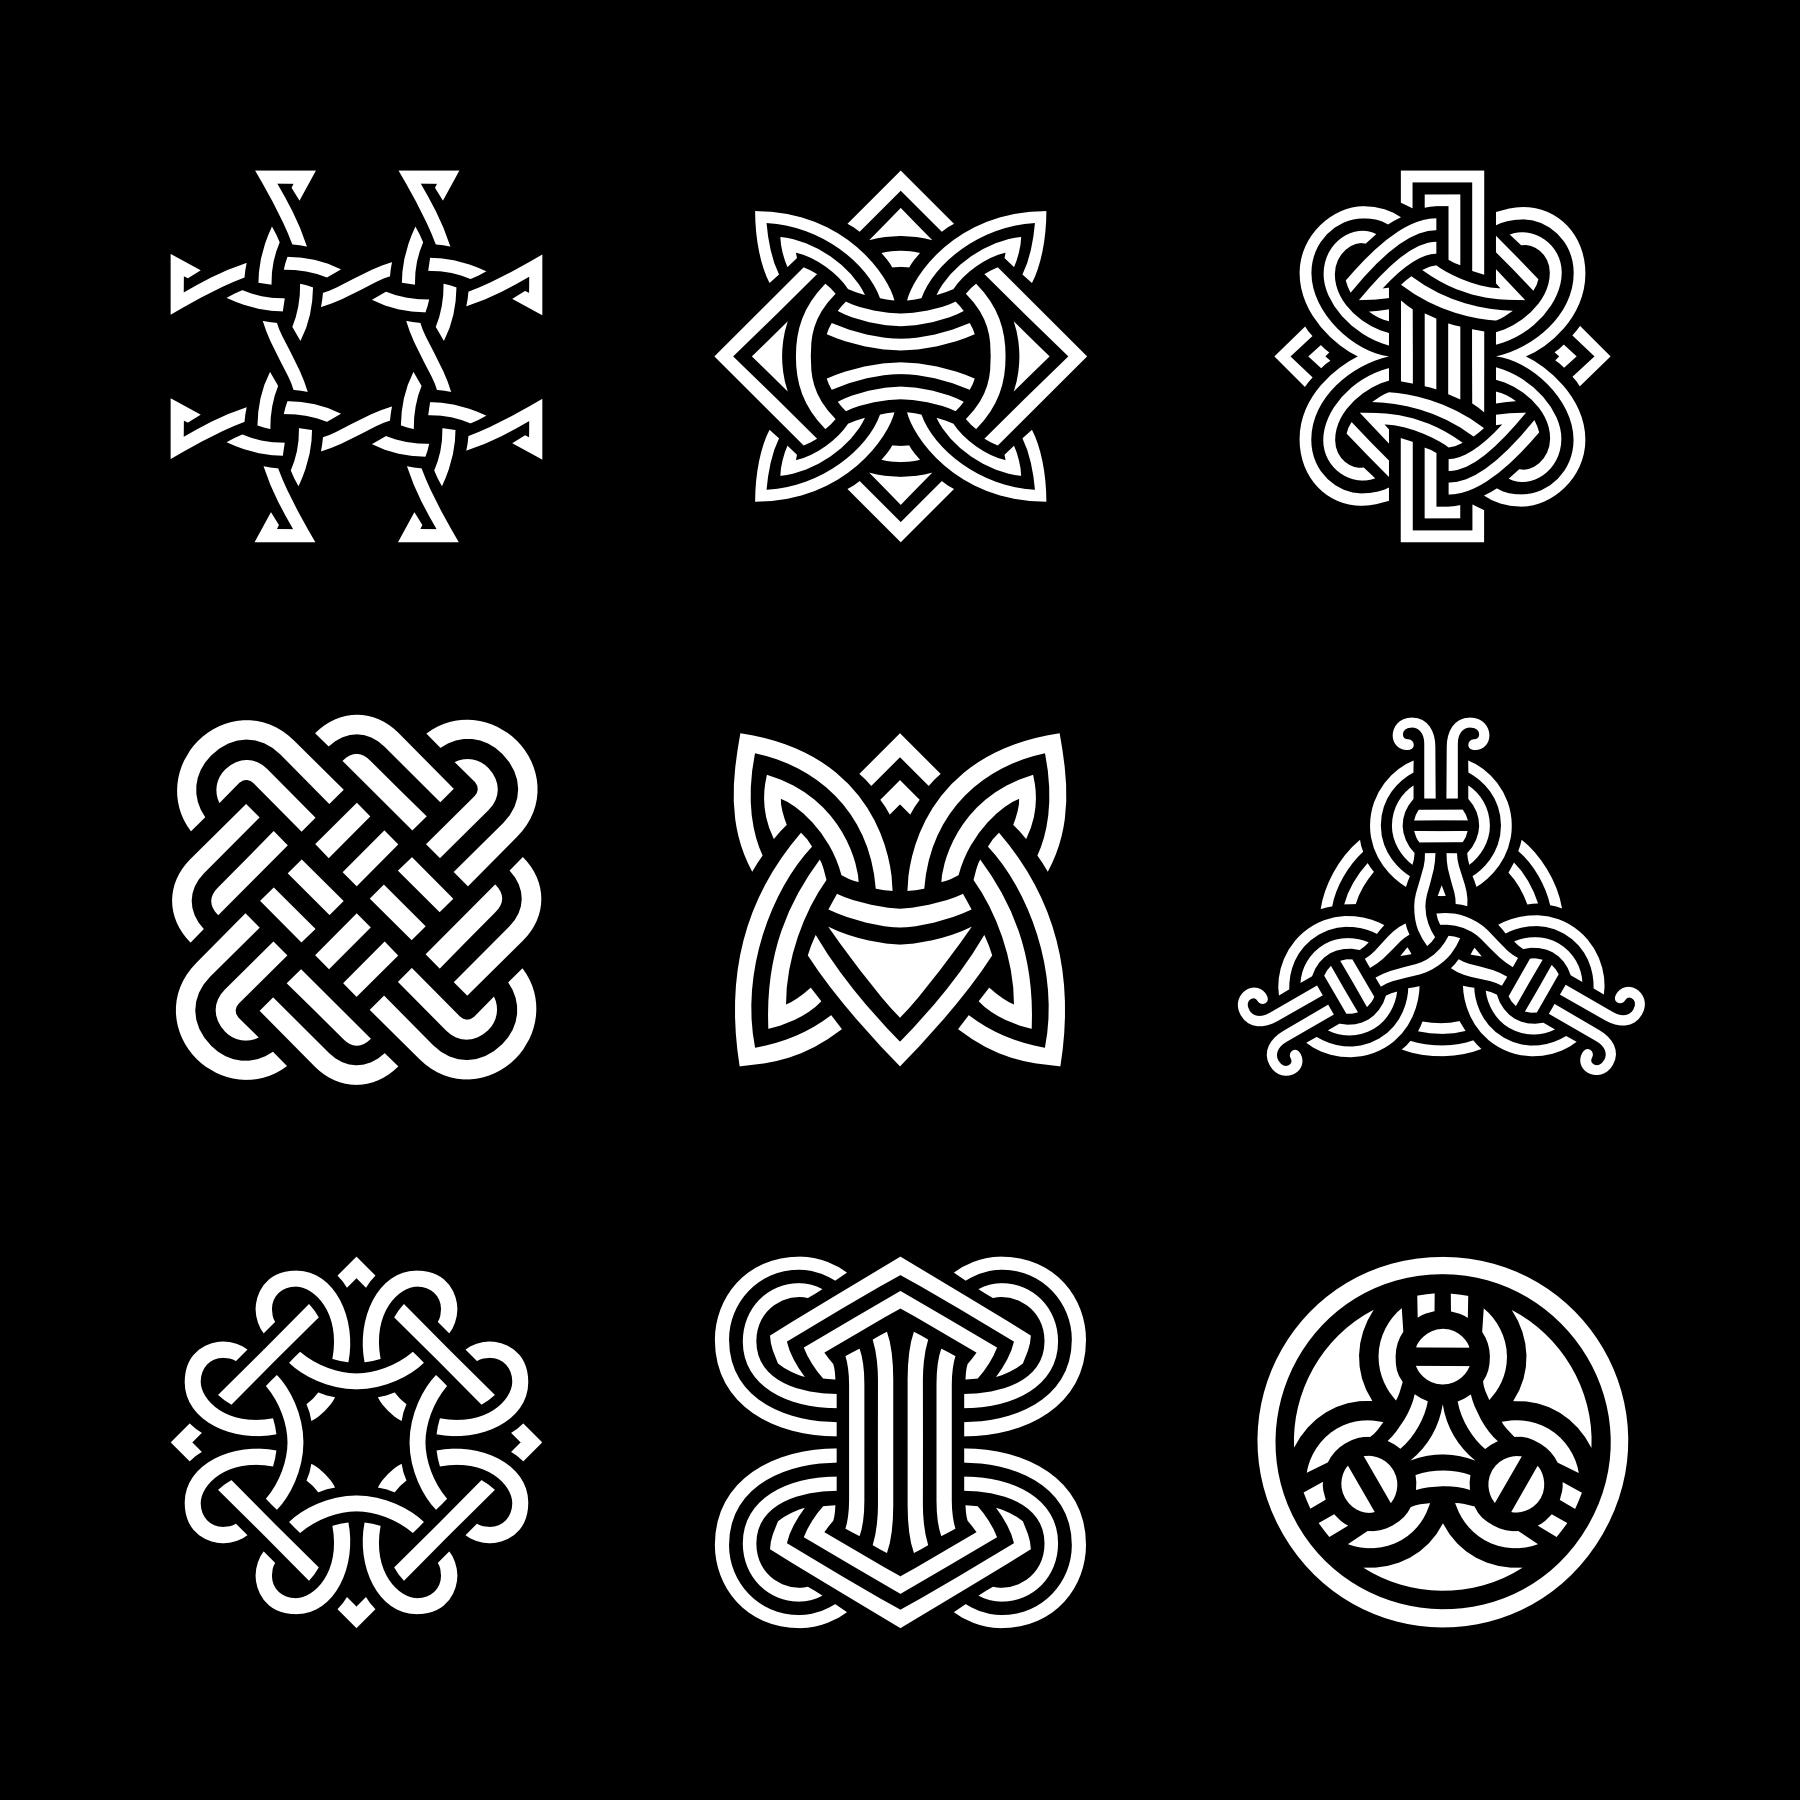 Borre Style Heathen Pinterest Viking Art Viking Designs And